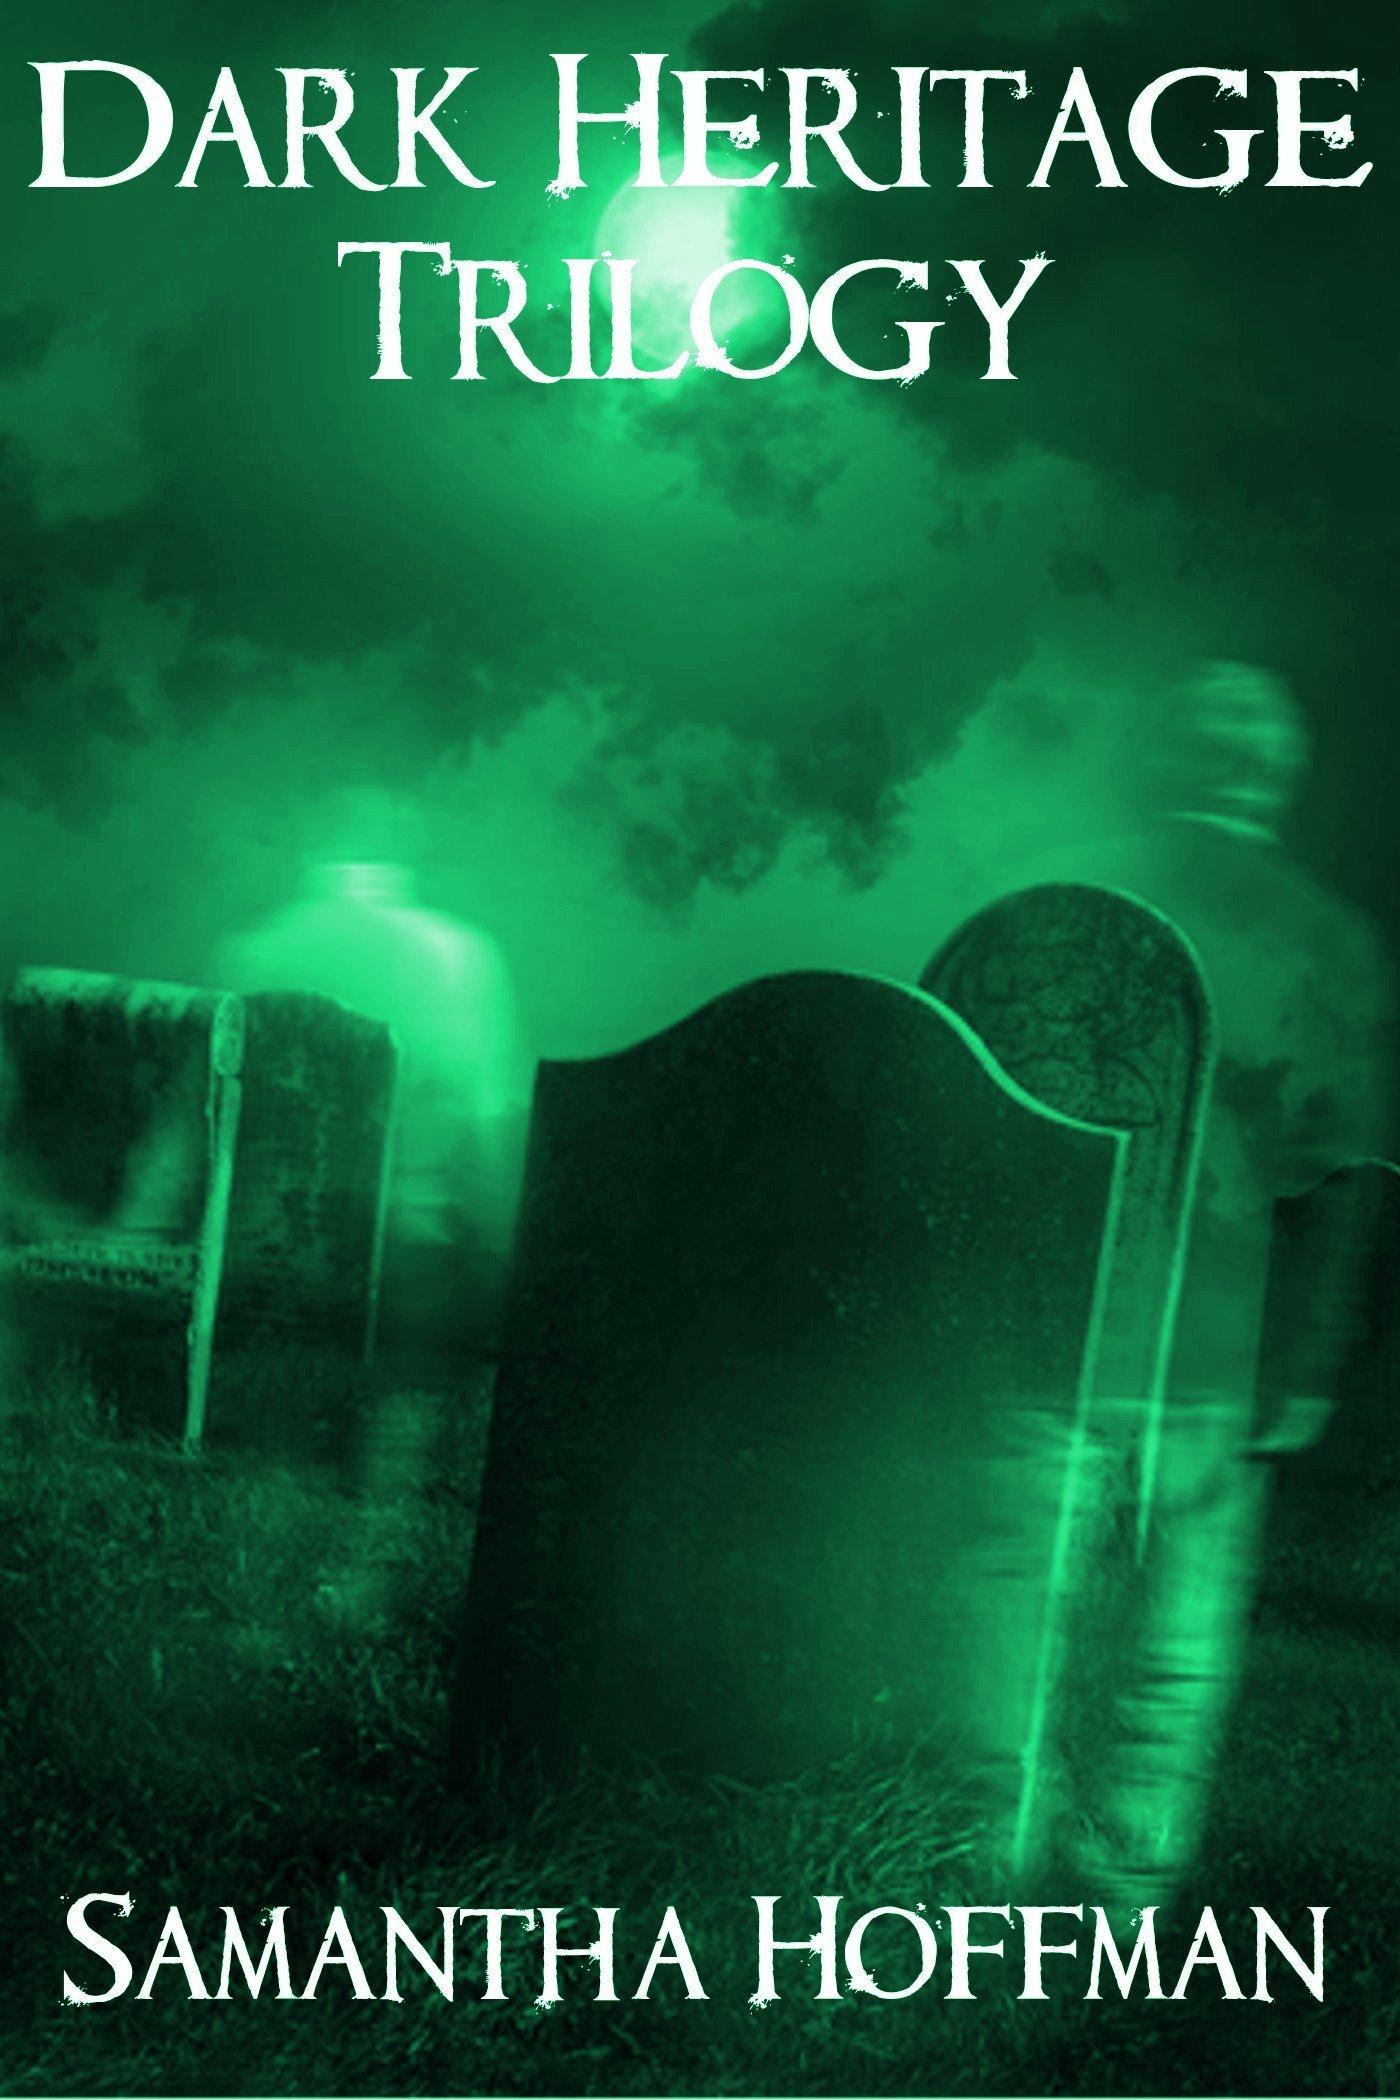 Dark Heritage Trilogy Samantha Hoffman